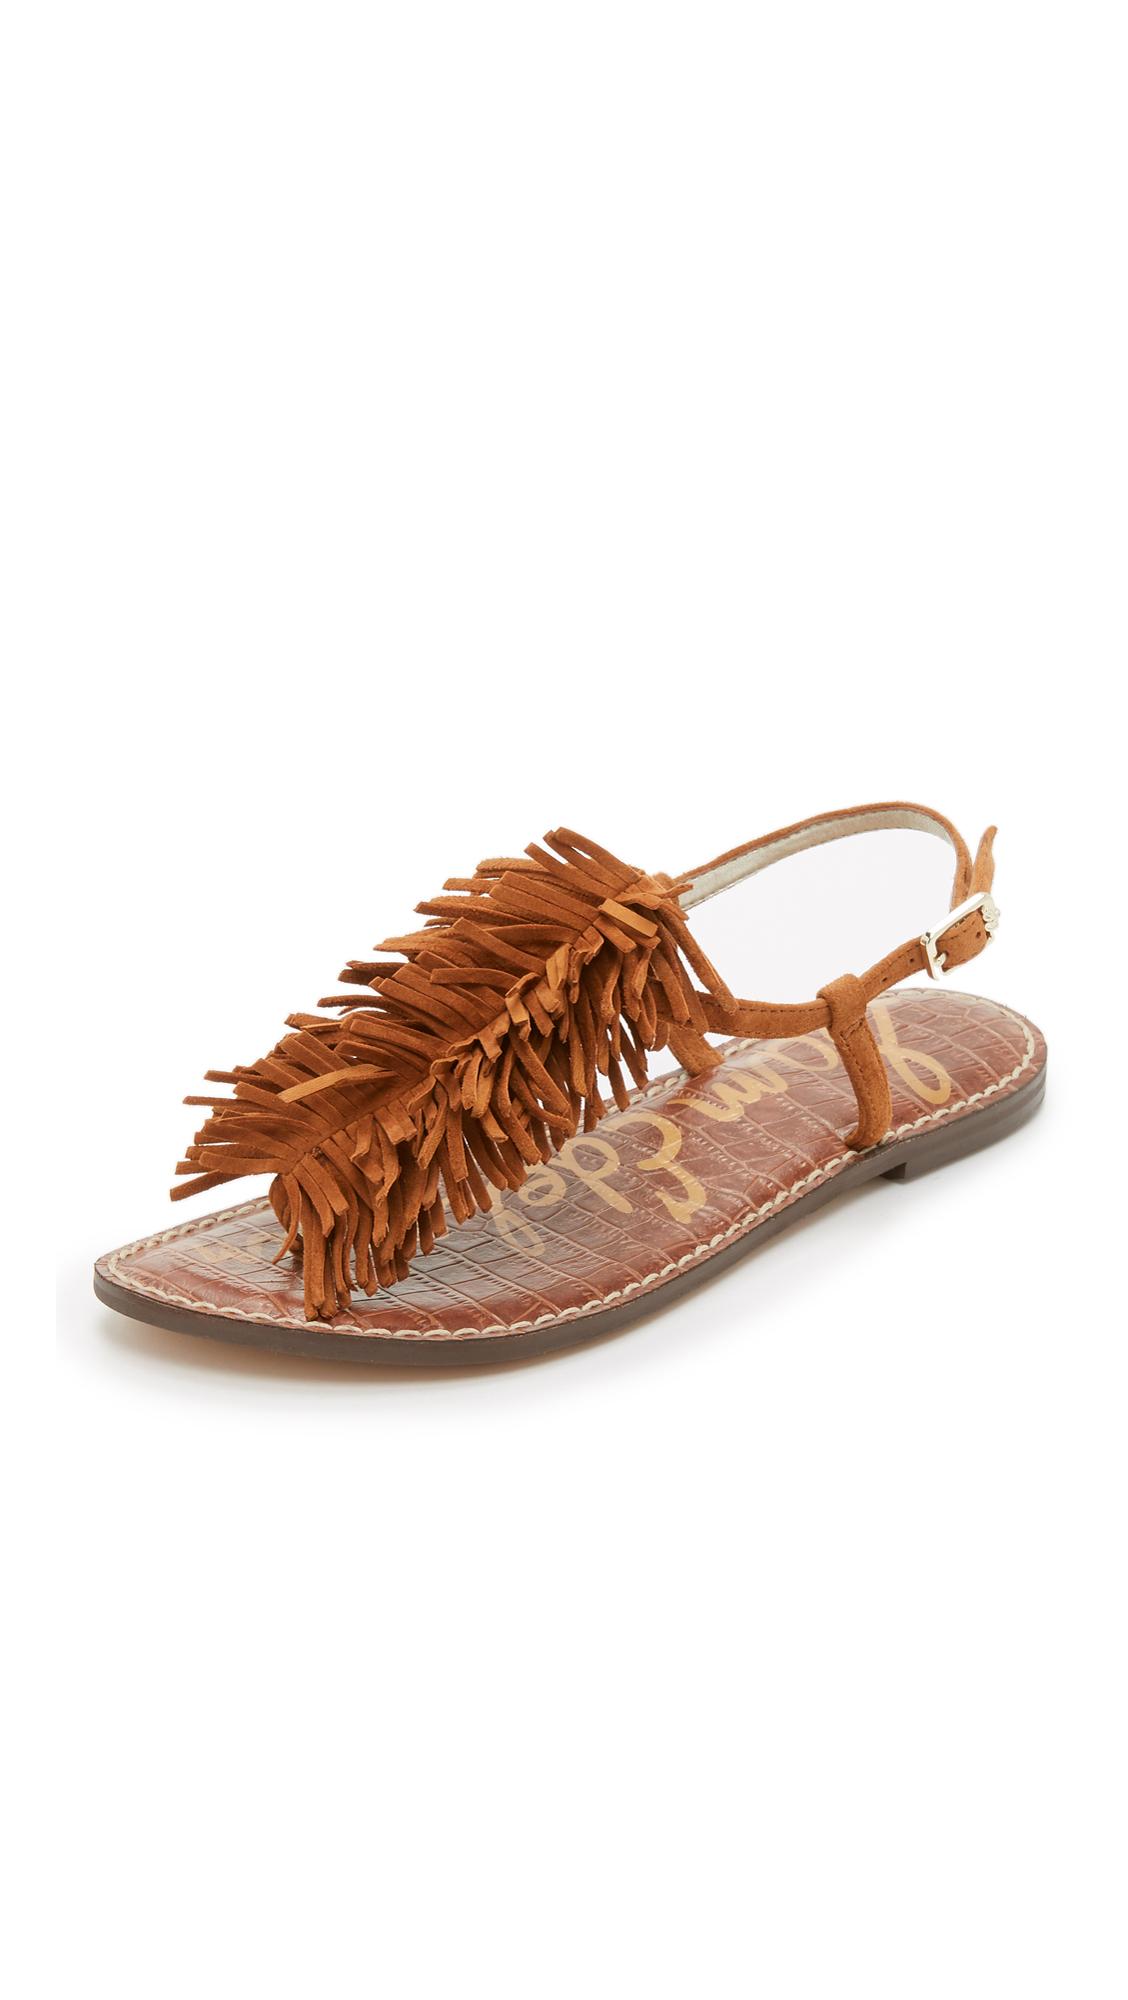 2737ef706e95 Sam Edelman Gela Fringe Flat Sandals